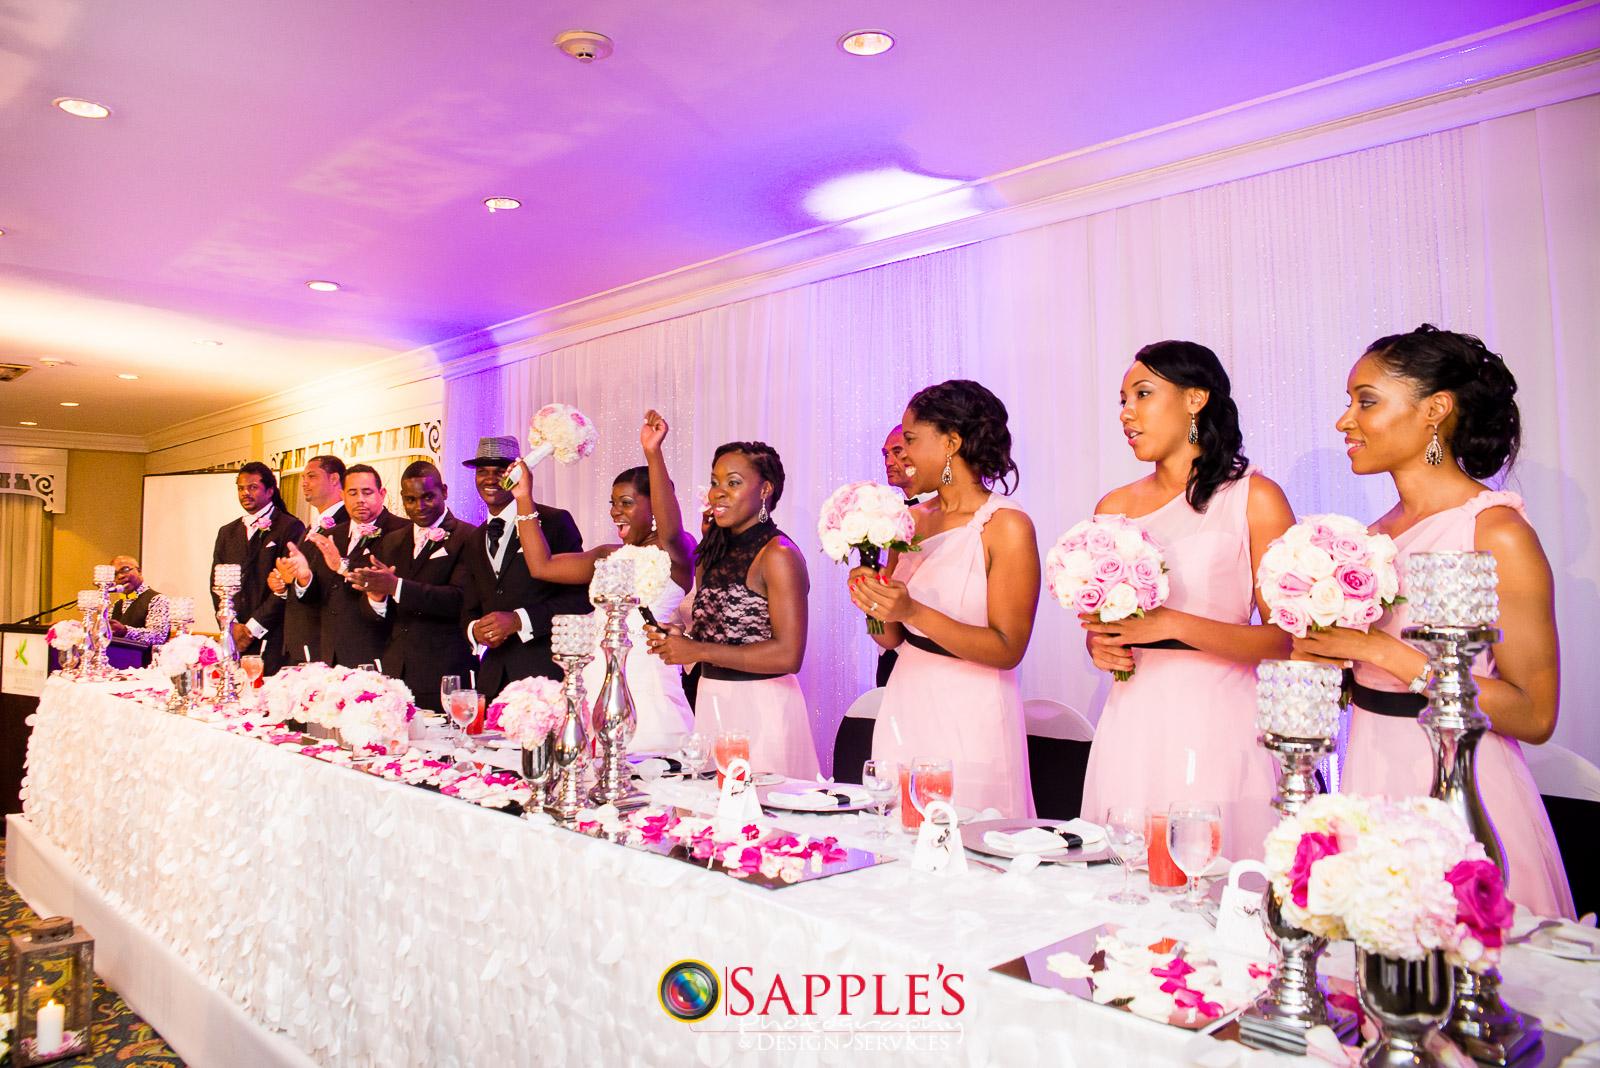 Debra and Hugo - Married - Sapple\'s PhotographySapple\'s Photography